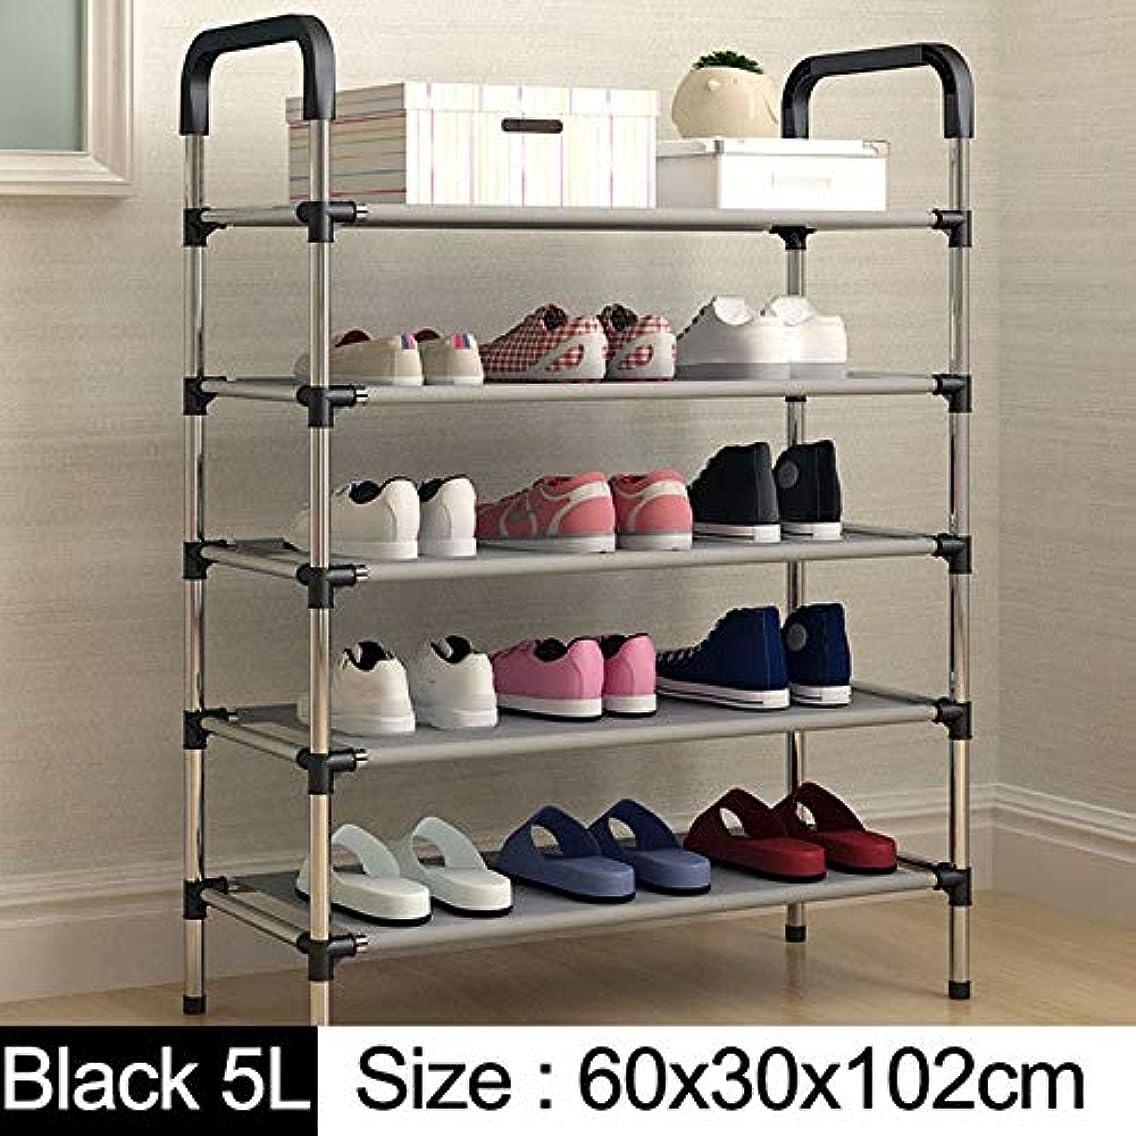 Metal Shoe Rack Bamboo Shoerack Shoes Organizer Home Furniture Super Saving Space Shoes Cabinet Shoes Closet